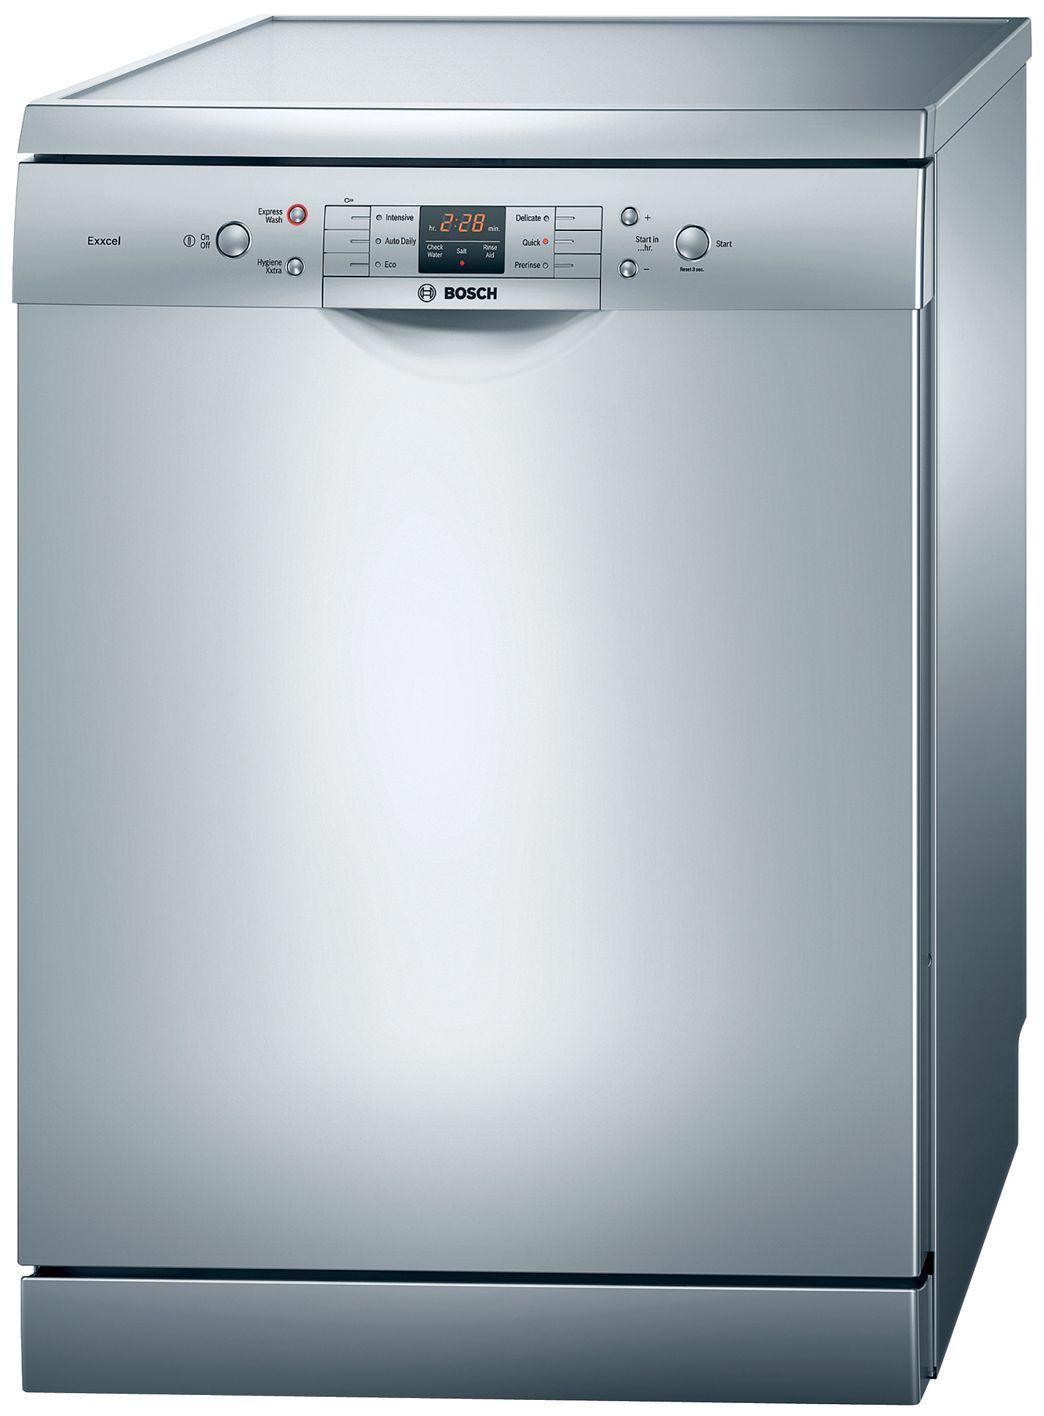 Bosch Dishwashers Think Global Print Local Mutfak